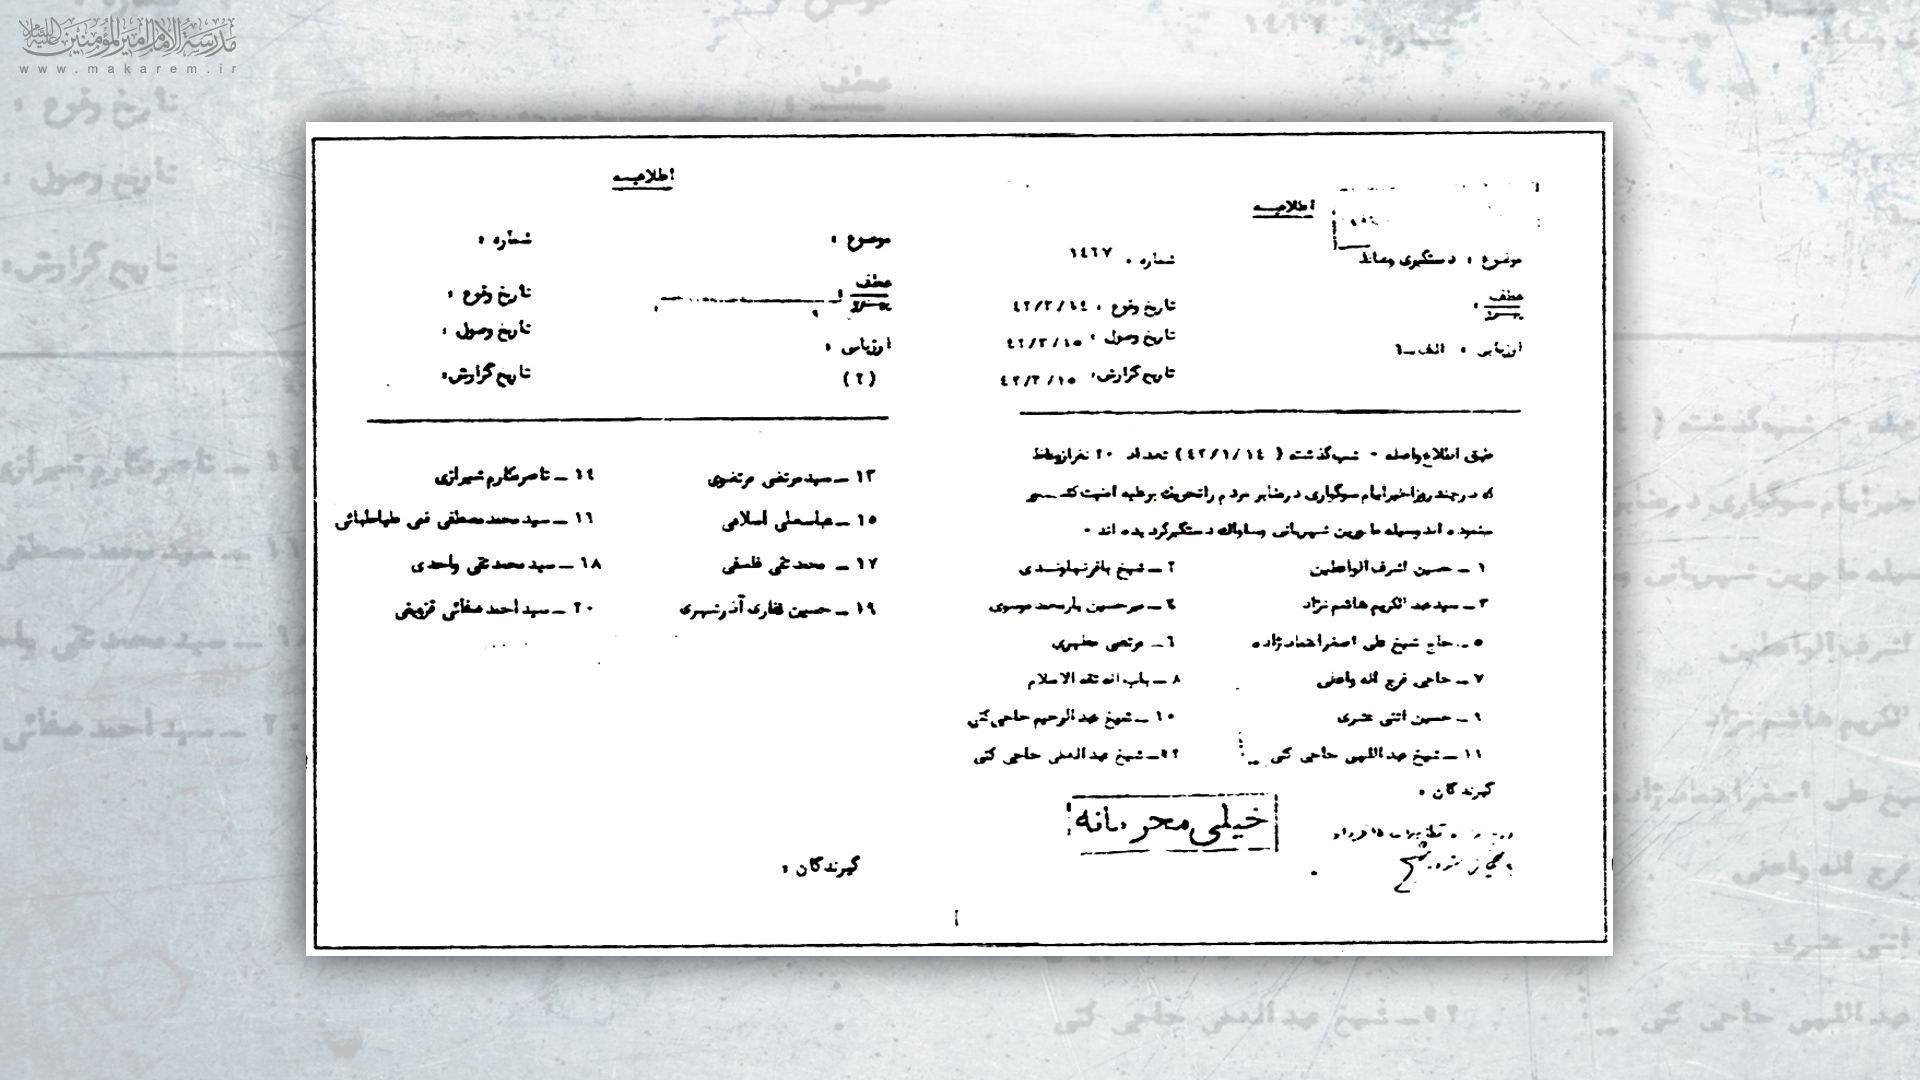 تصاویر ماندگار-مدرسه الامام امیر المومنین (ع)